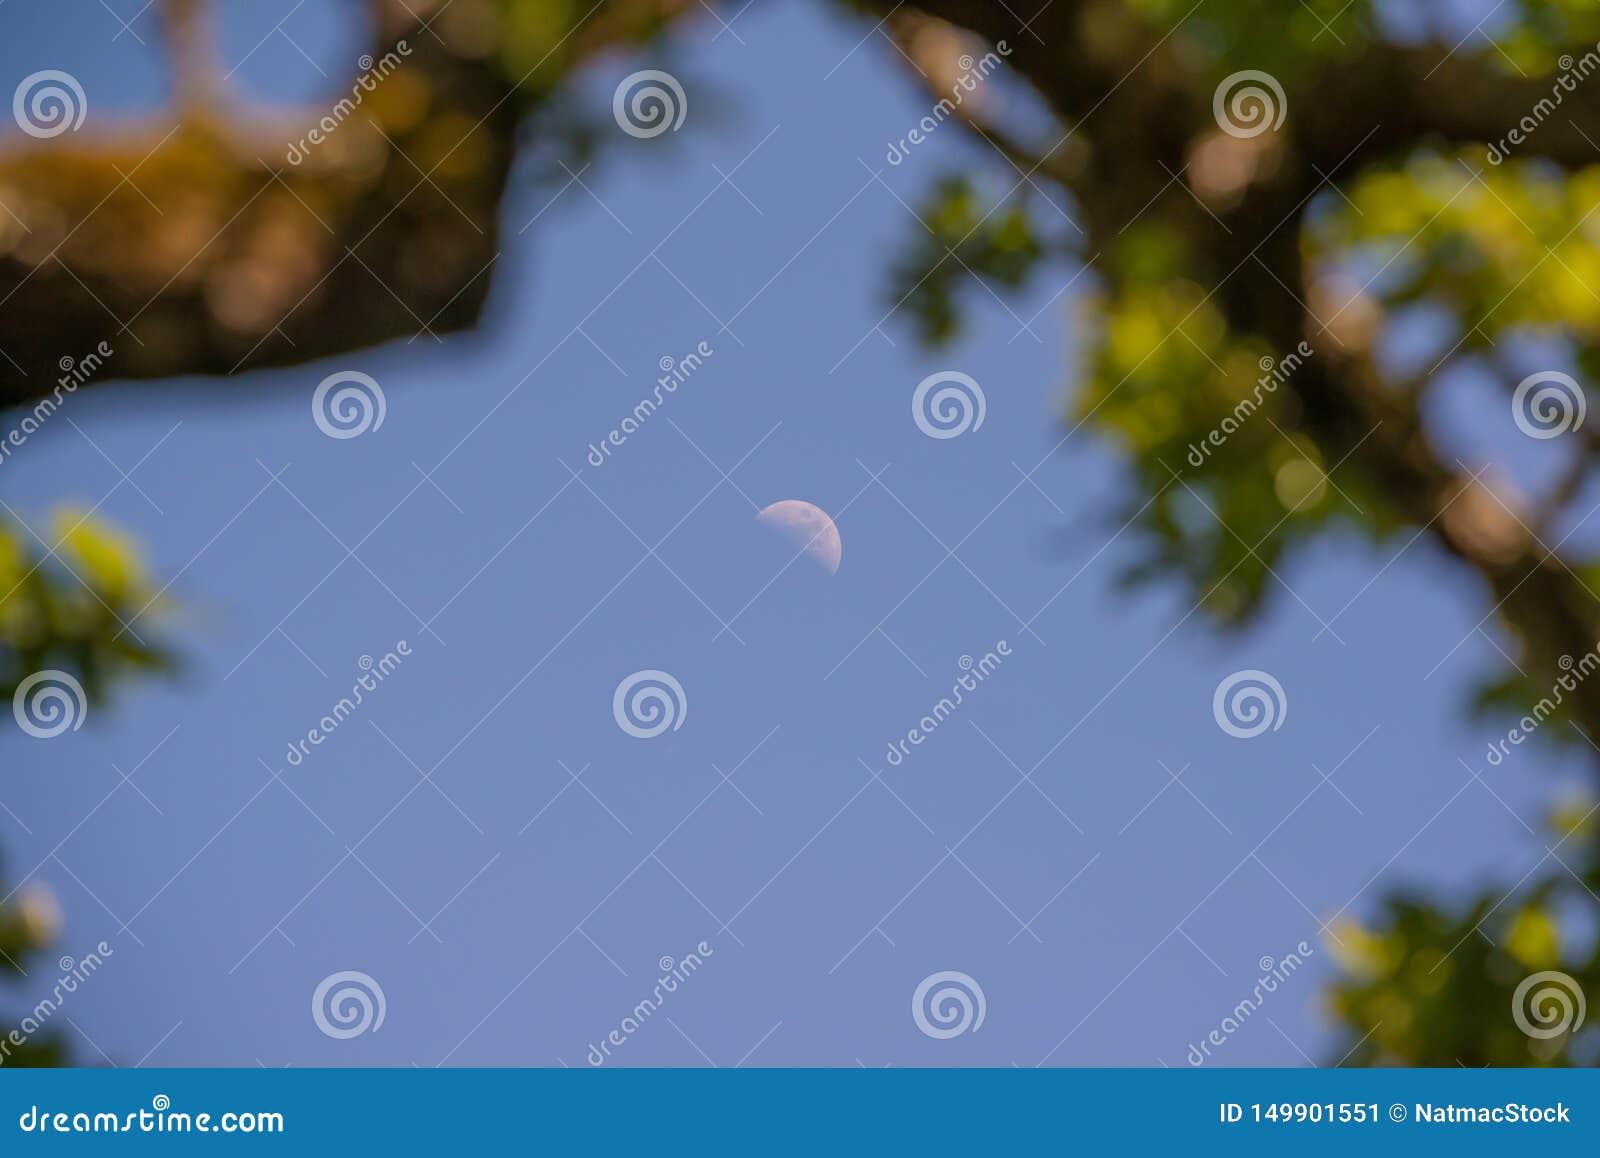 Luna vista a trav?s de los ?rboles